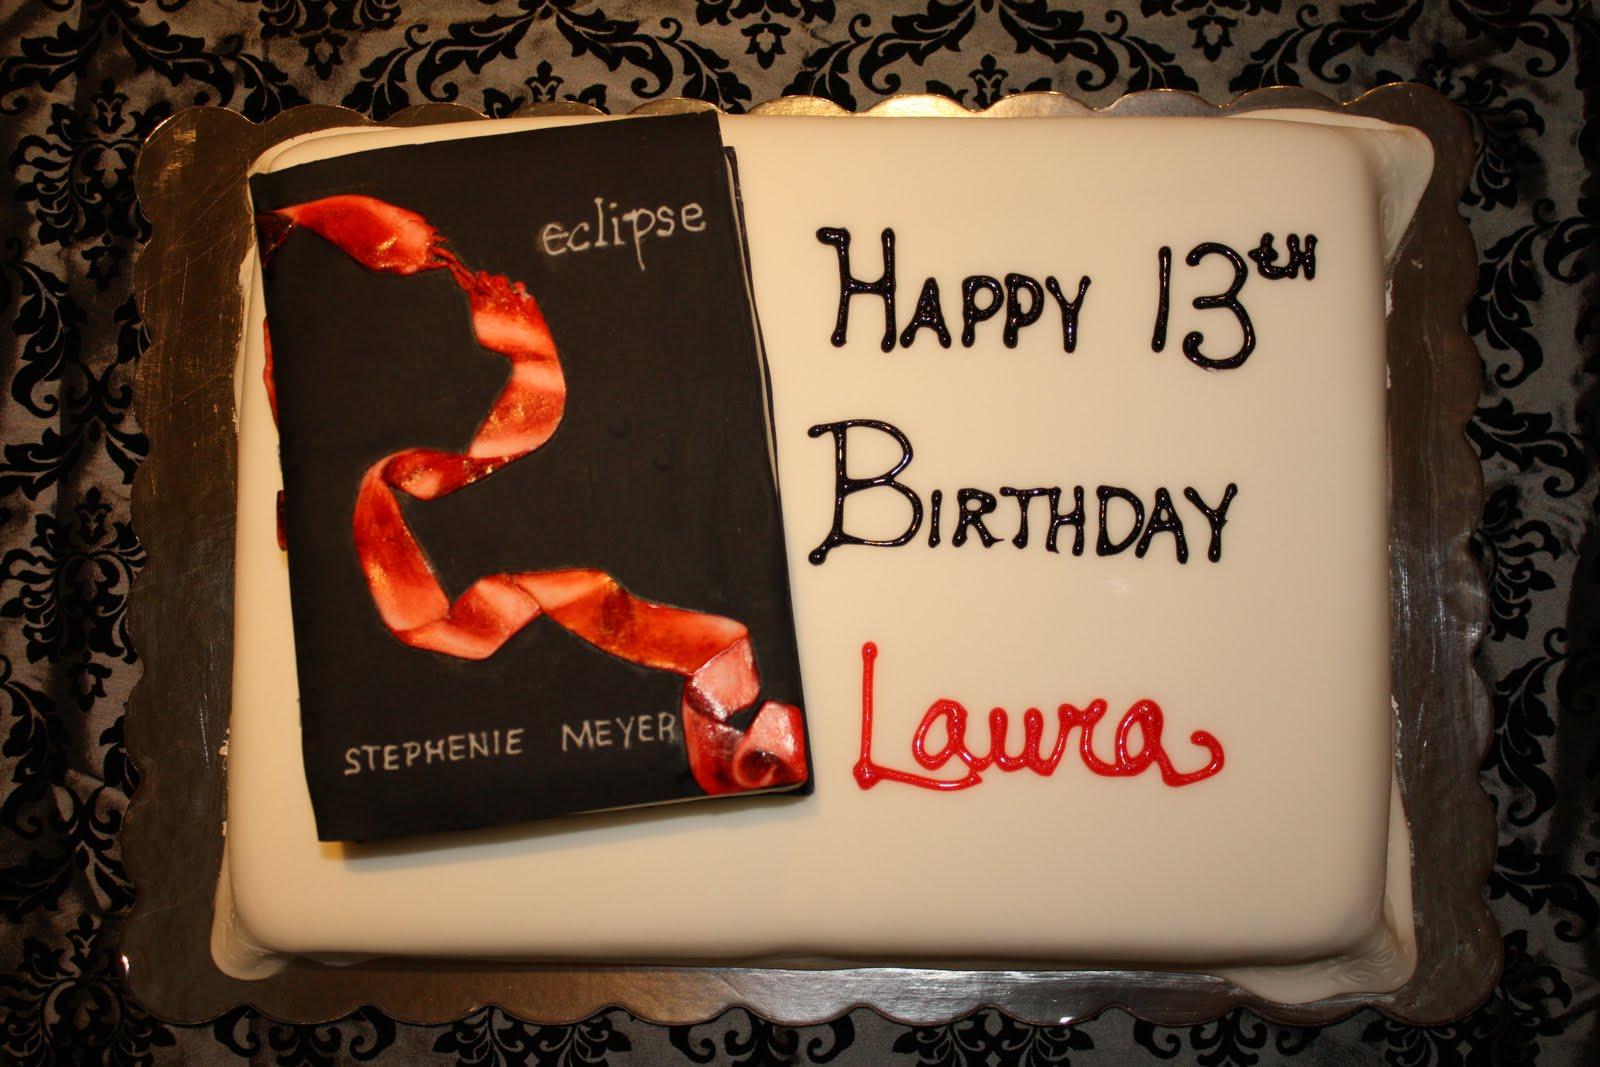 Twilight Eclipse Birthday Cake